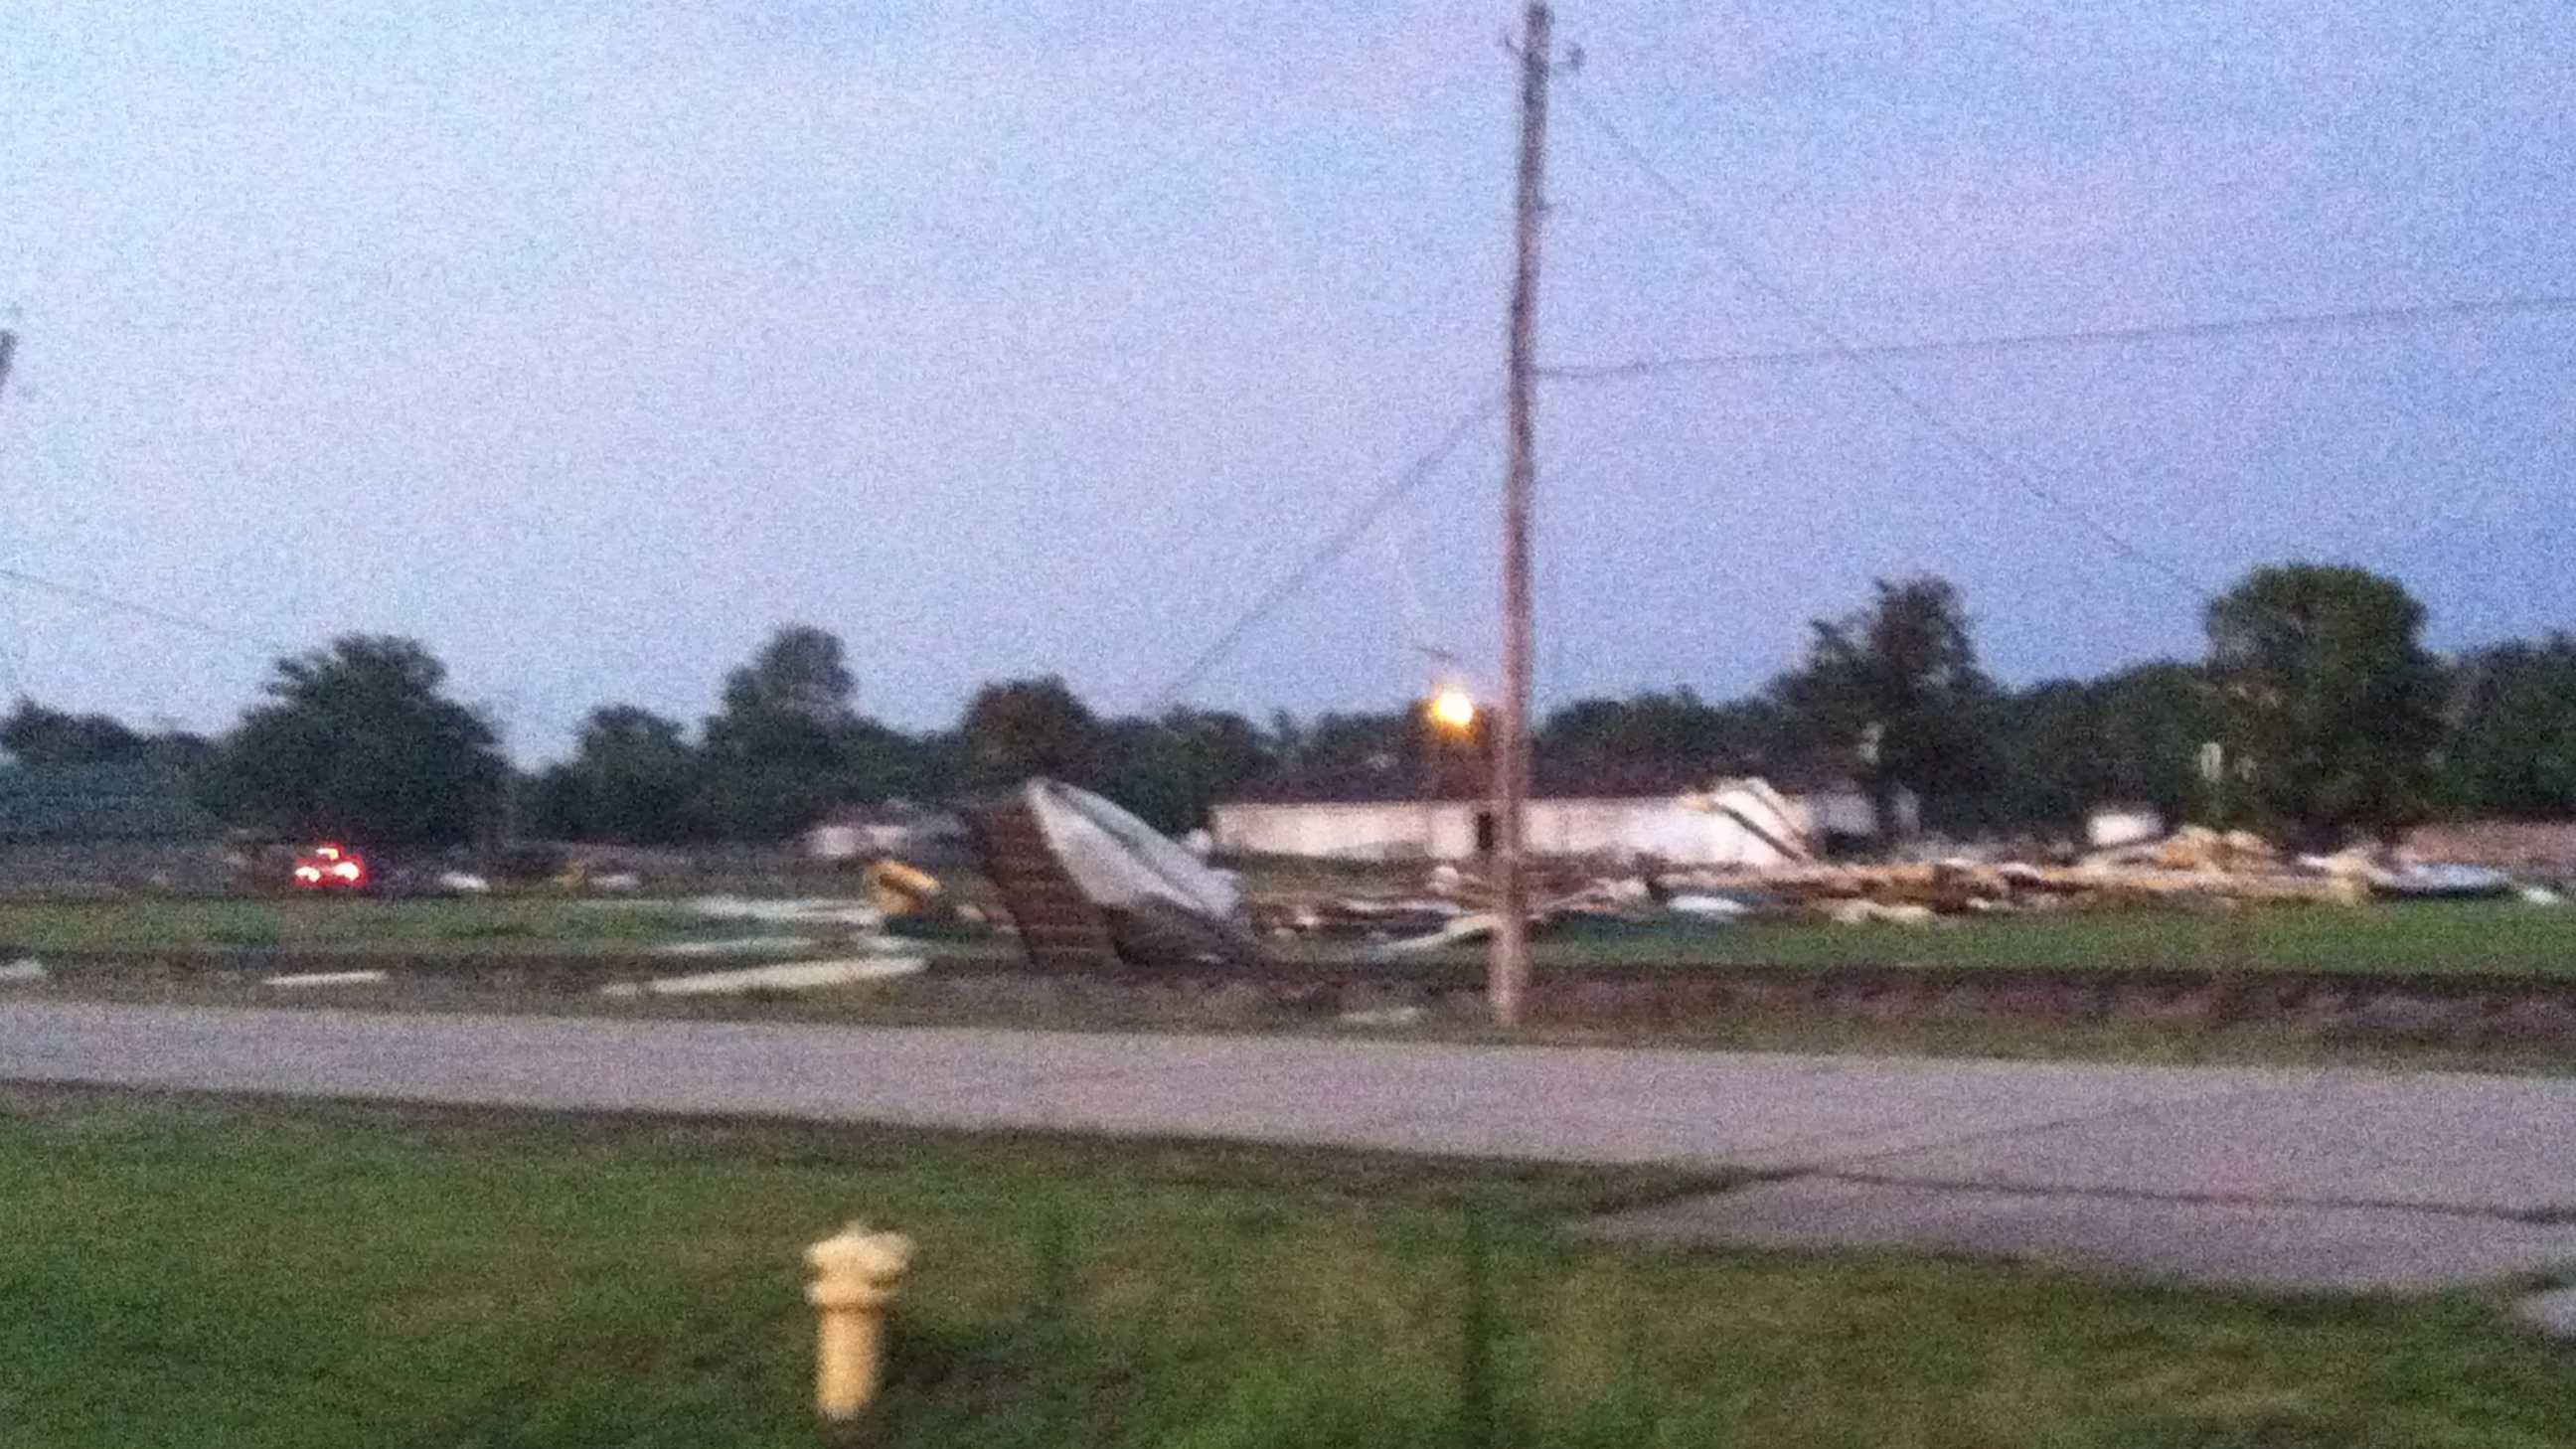 Businesses damaged after storm hits region